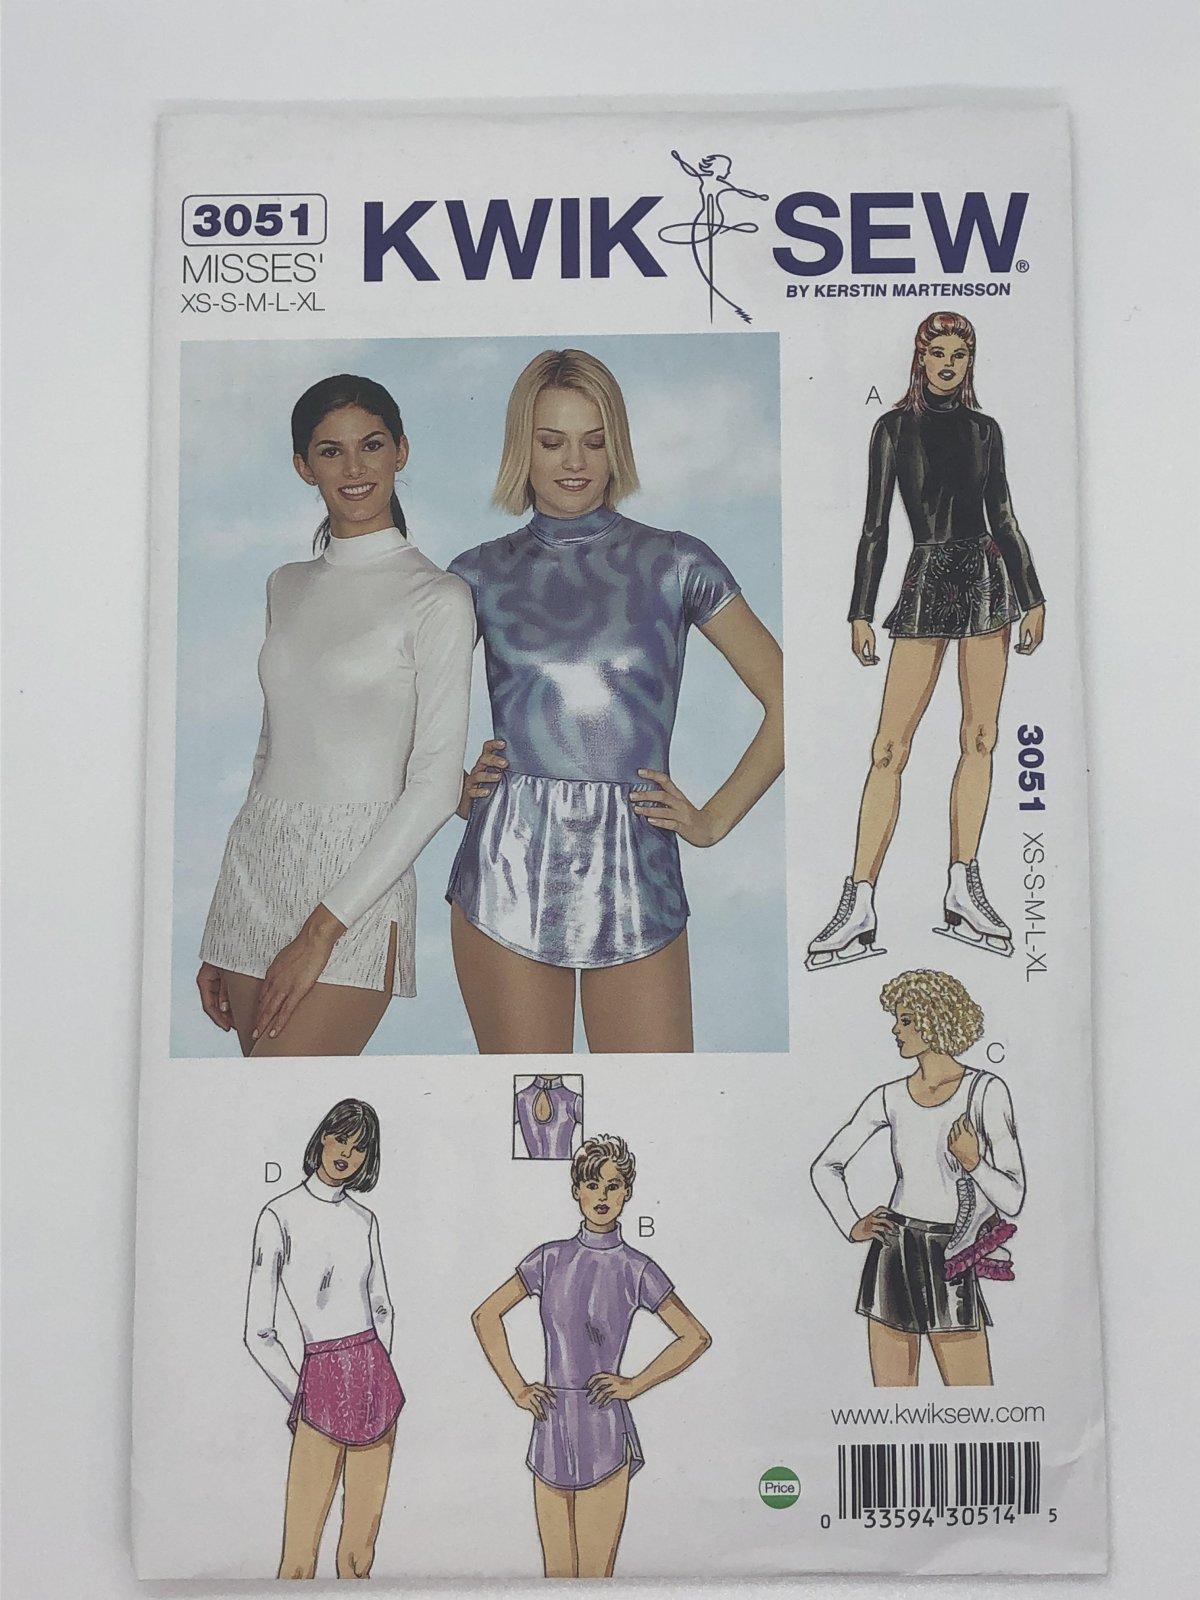 Kwik Sew 3051 Sizes XS-XL